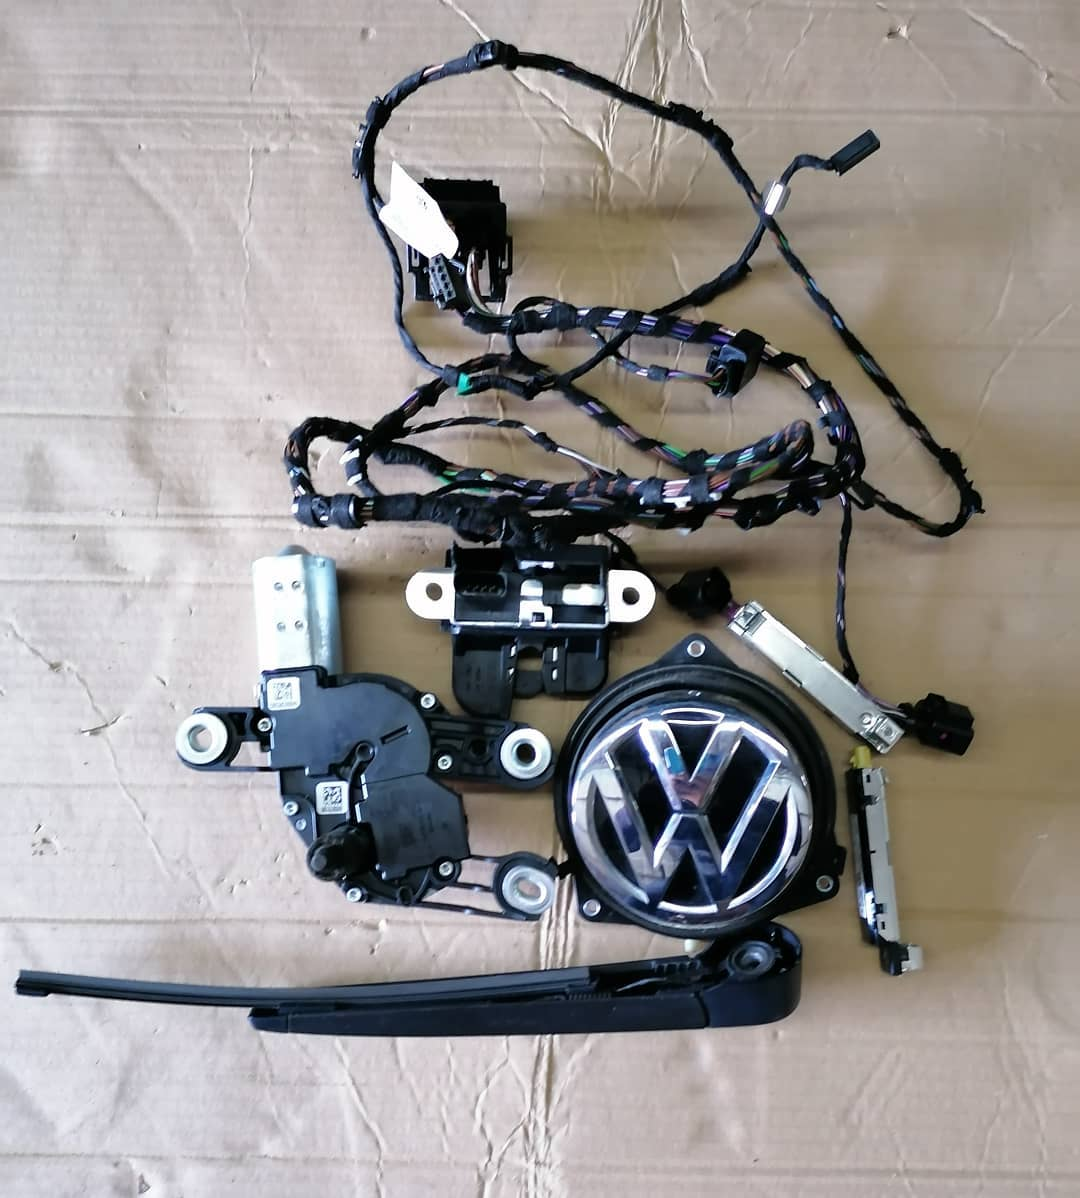 VW Golf Vll Hatchbak 2017 Mecanism hayon Deschidere cu emblema, stergator, motoras stergator, broasca, amplificatot antena si instalatie